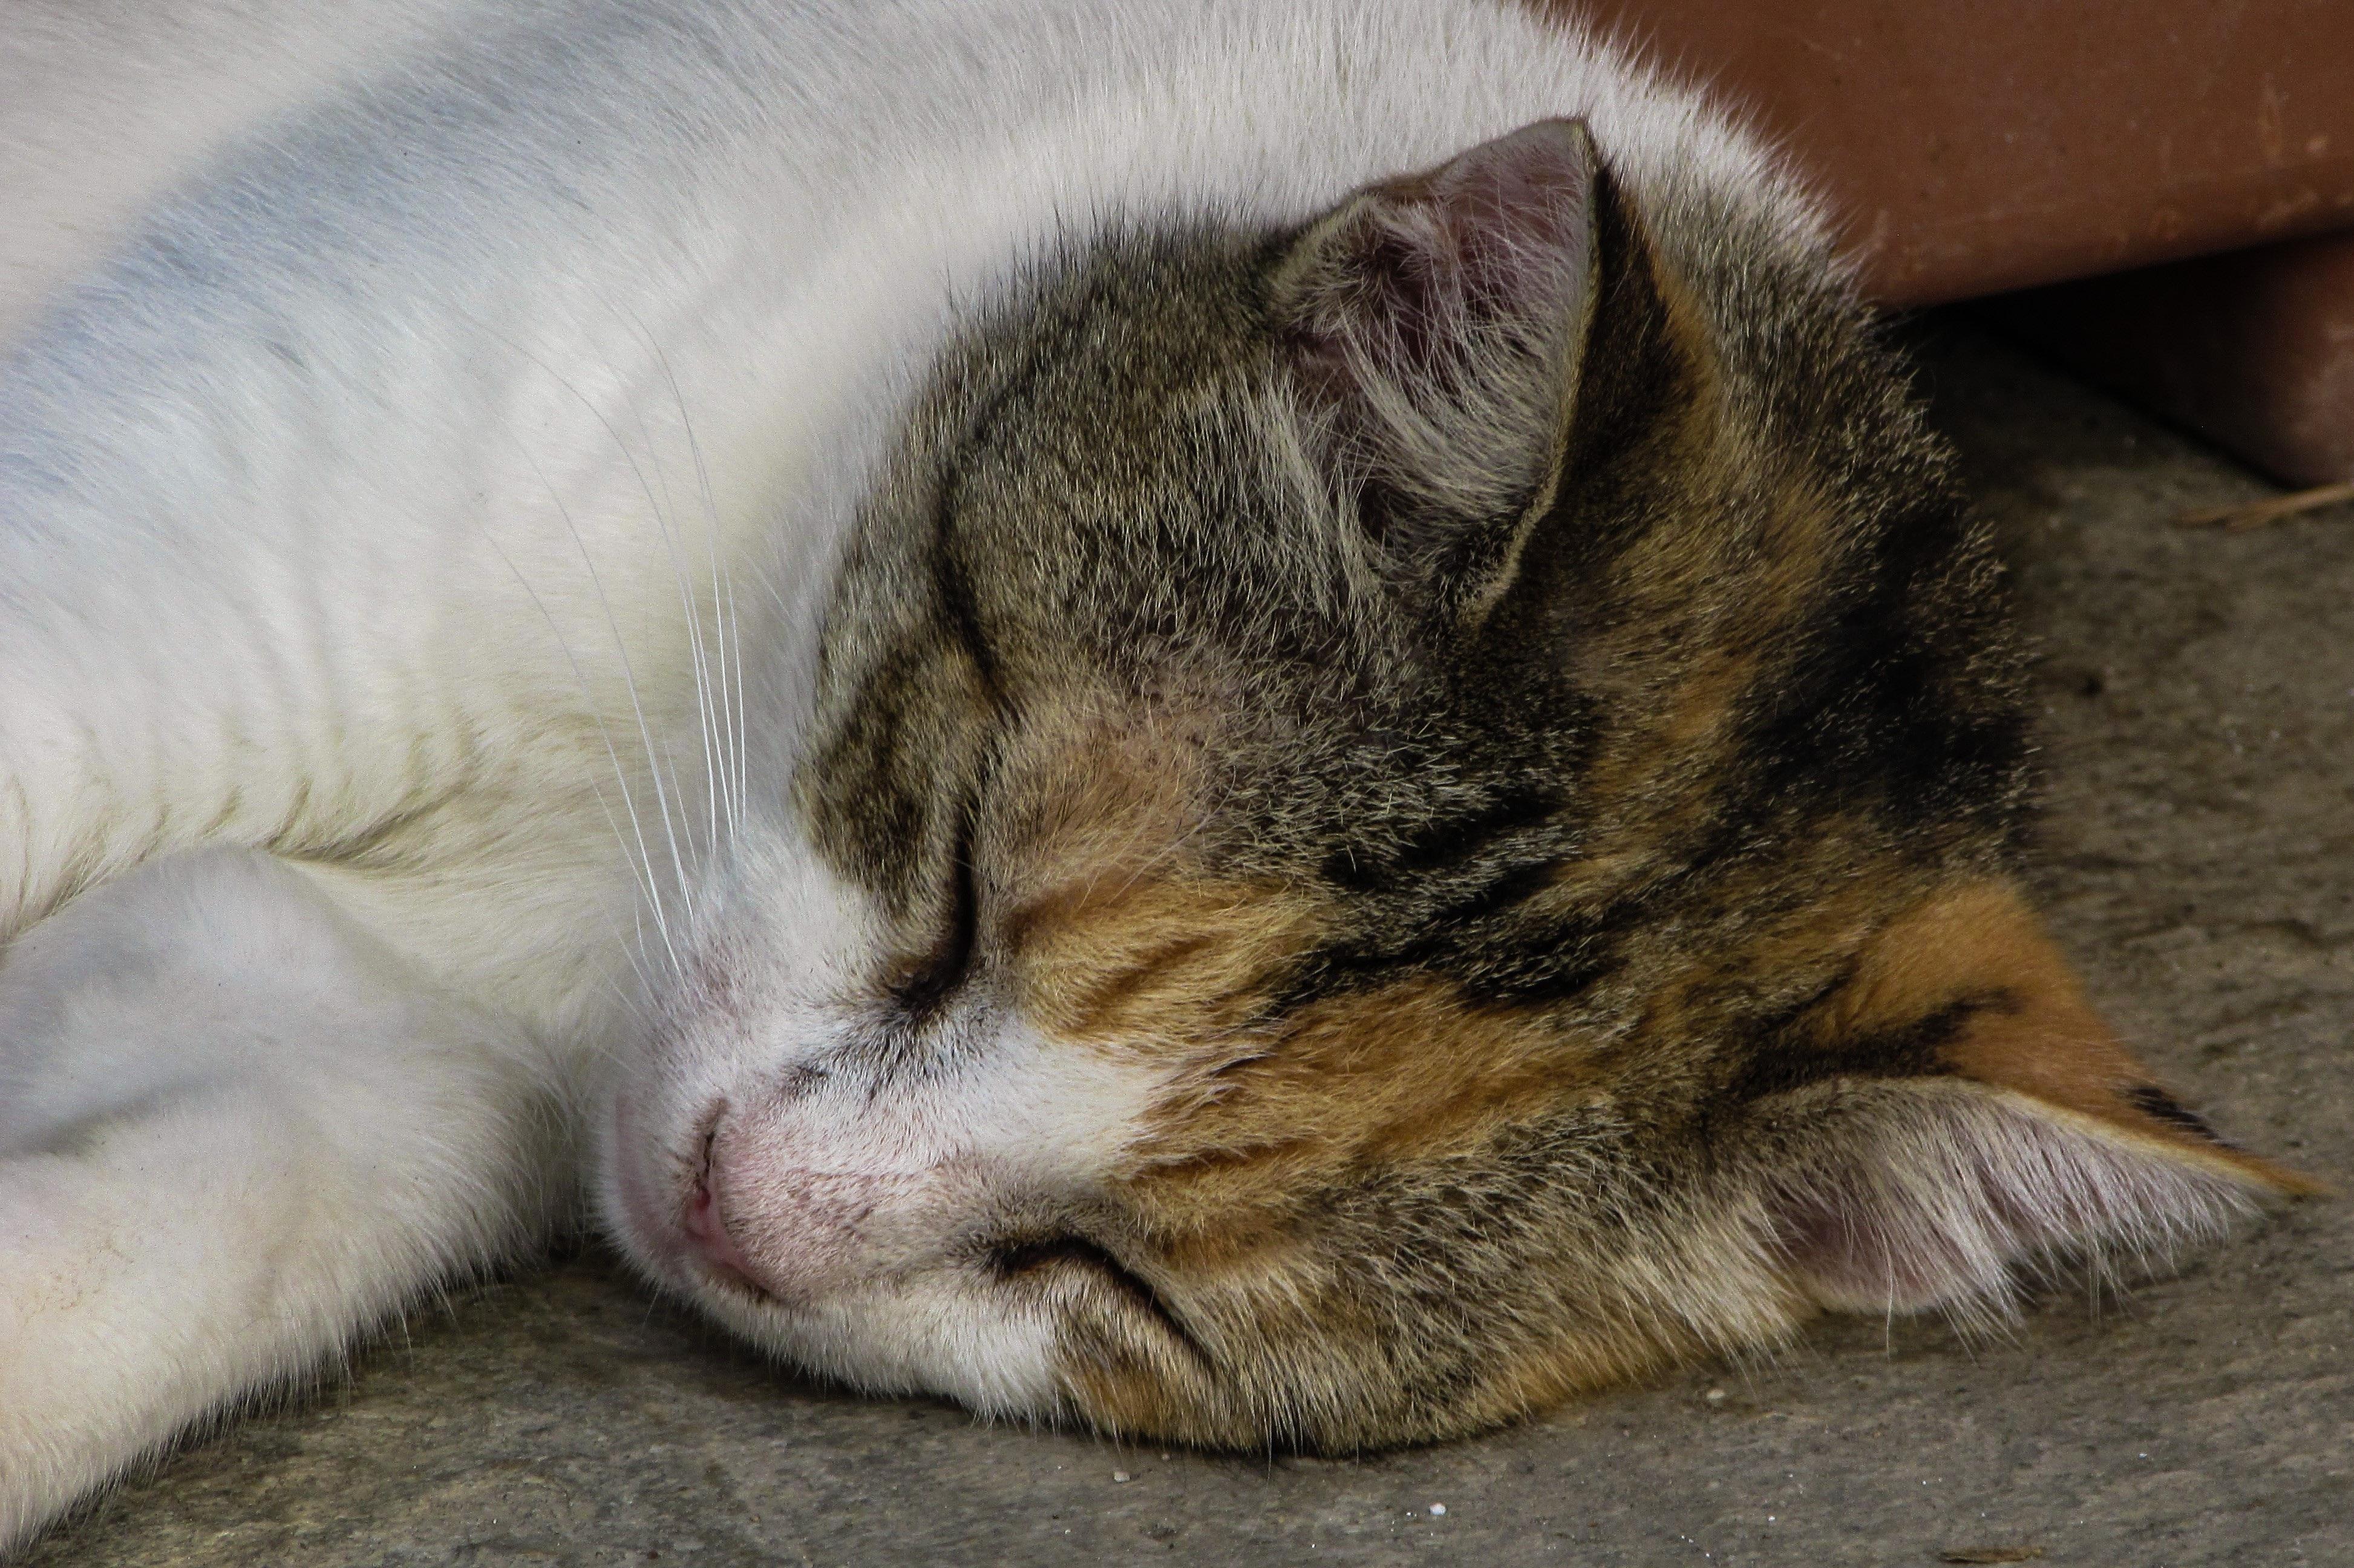 Koleksi Foto Lucu Kucing Tidur Kantor Meme